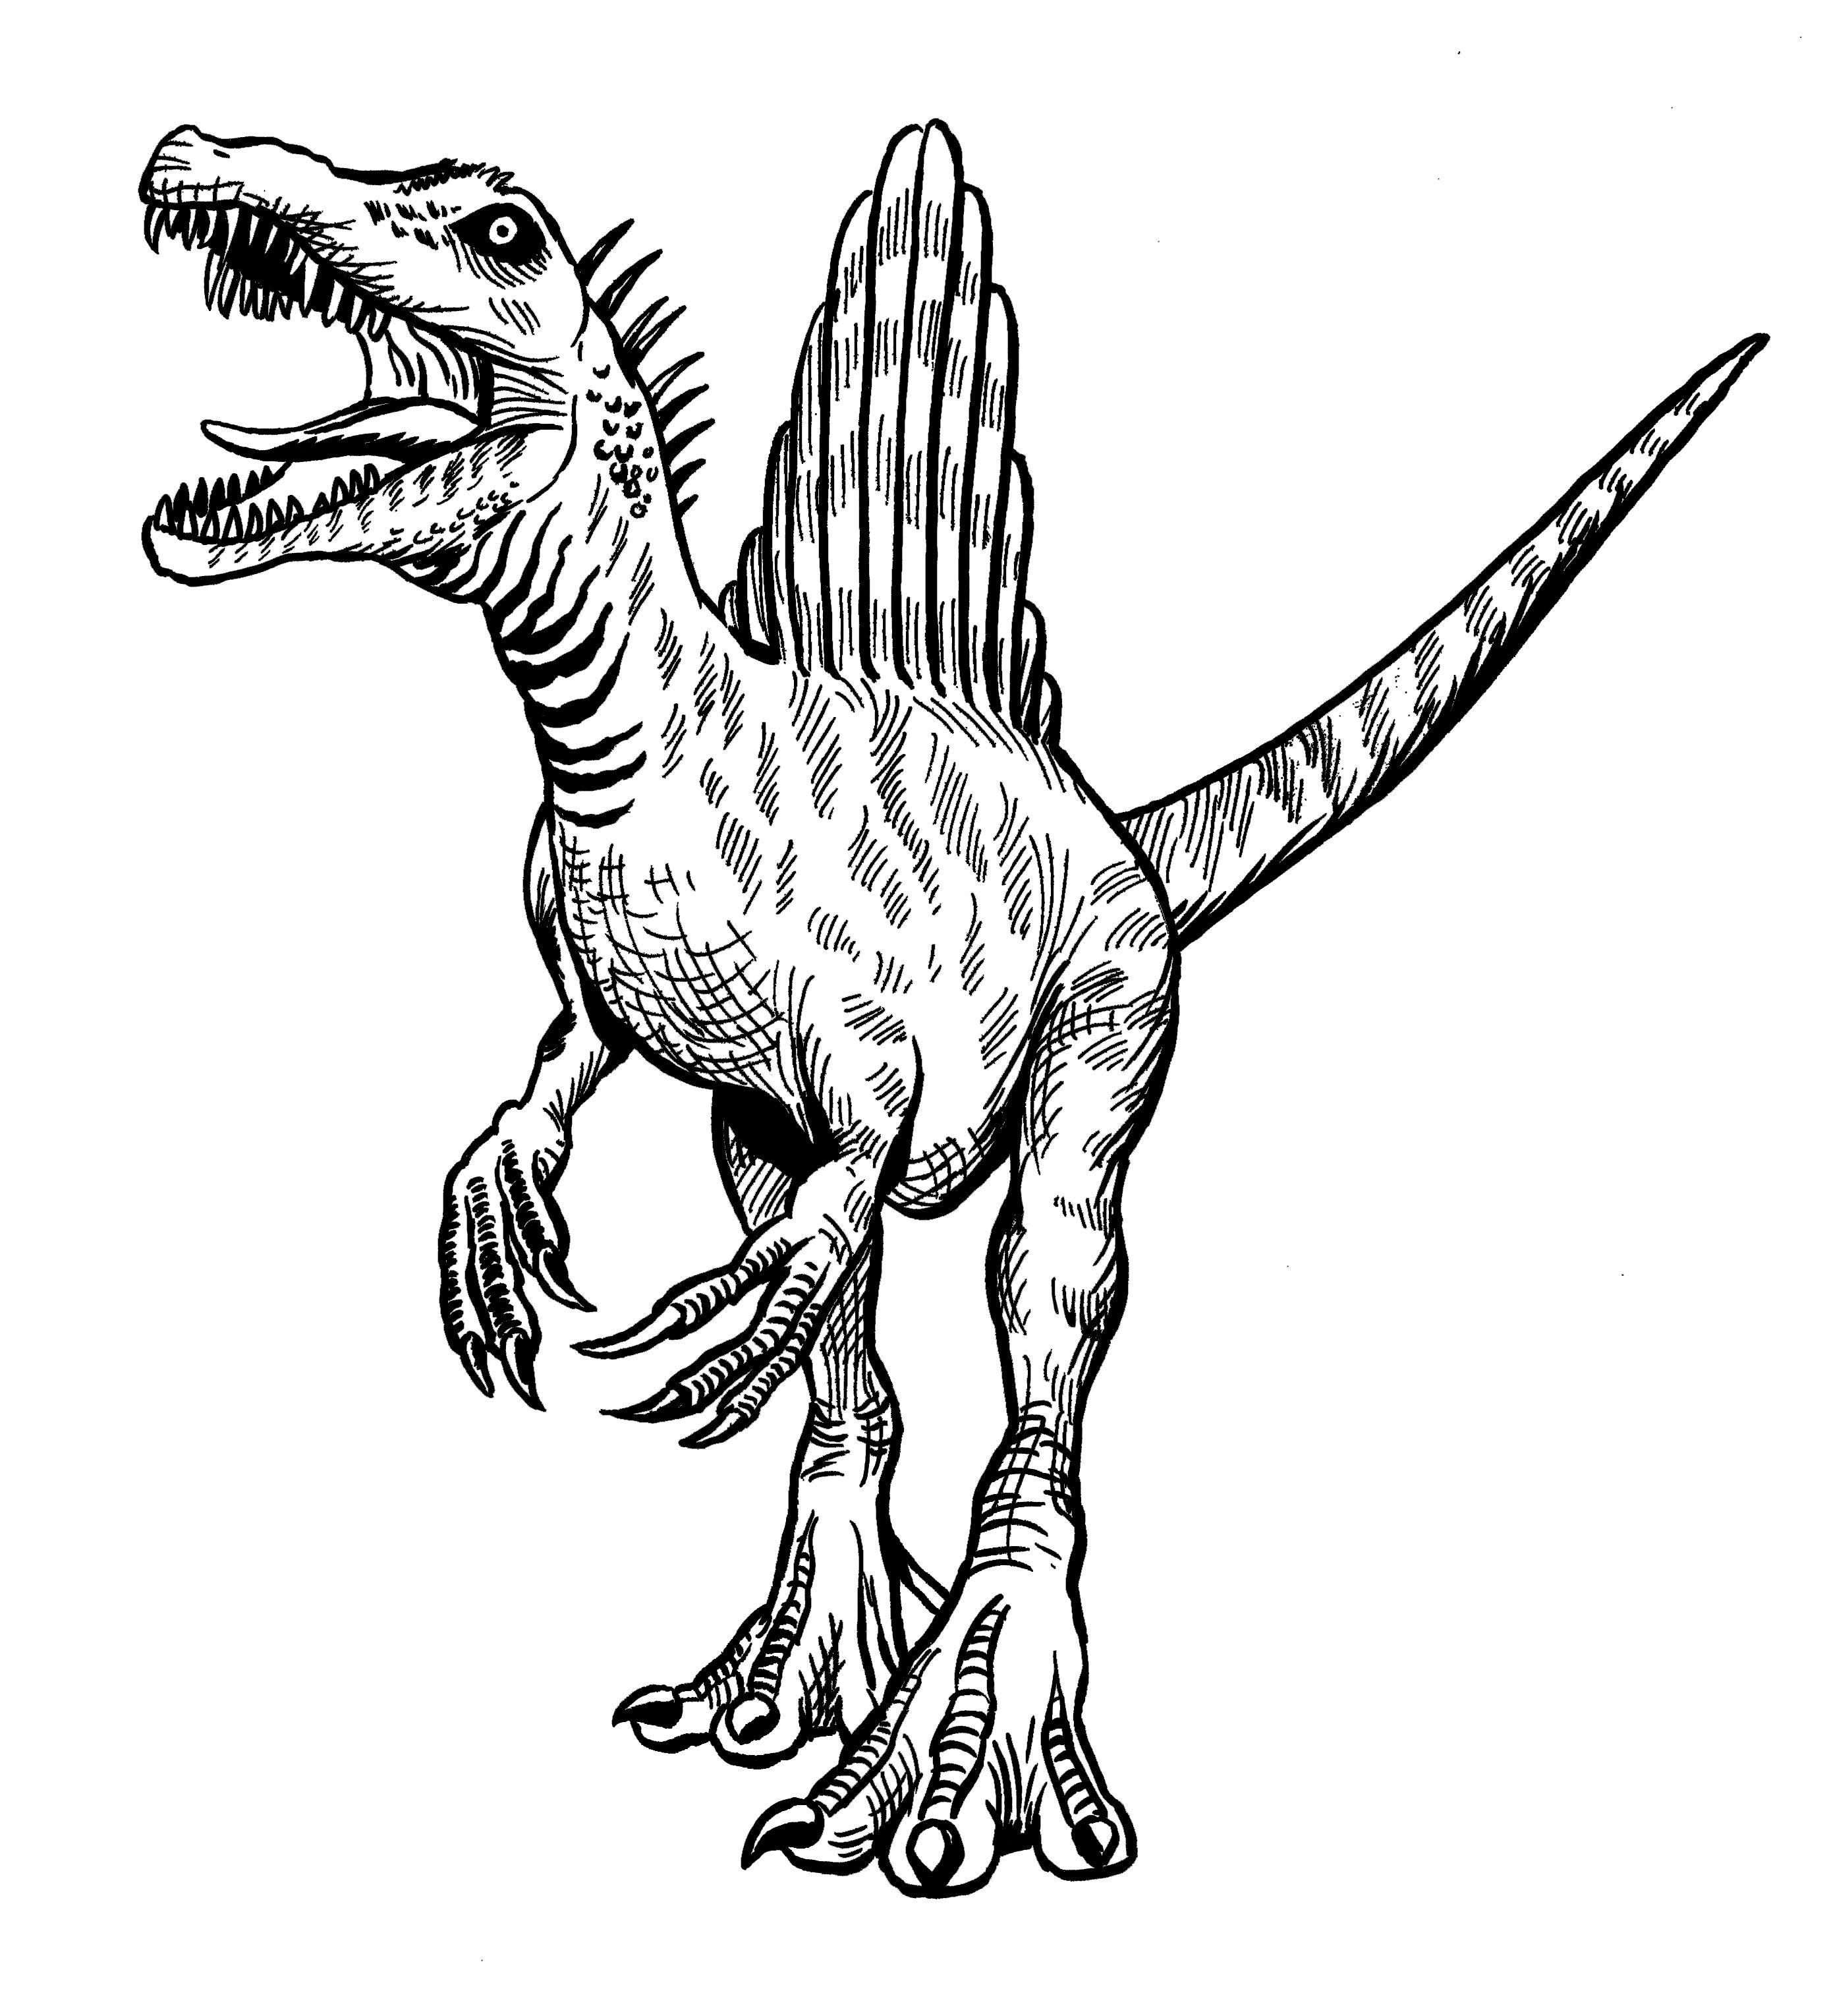 Black And White Spinosaurus Dinosaurs Illustration